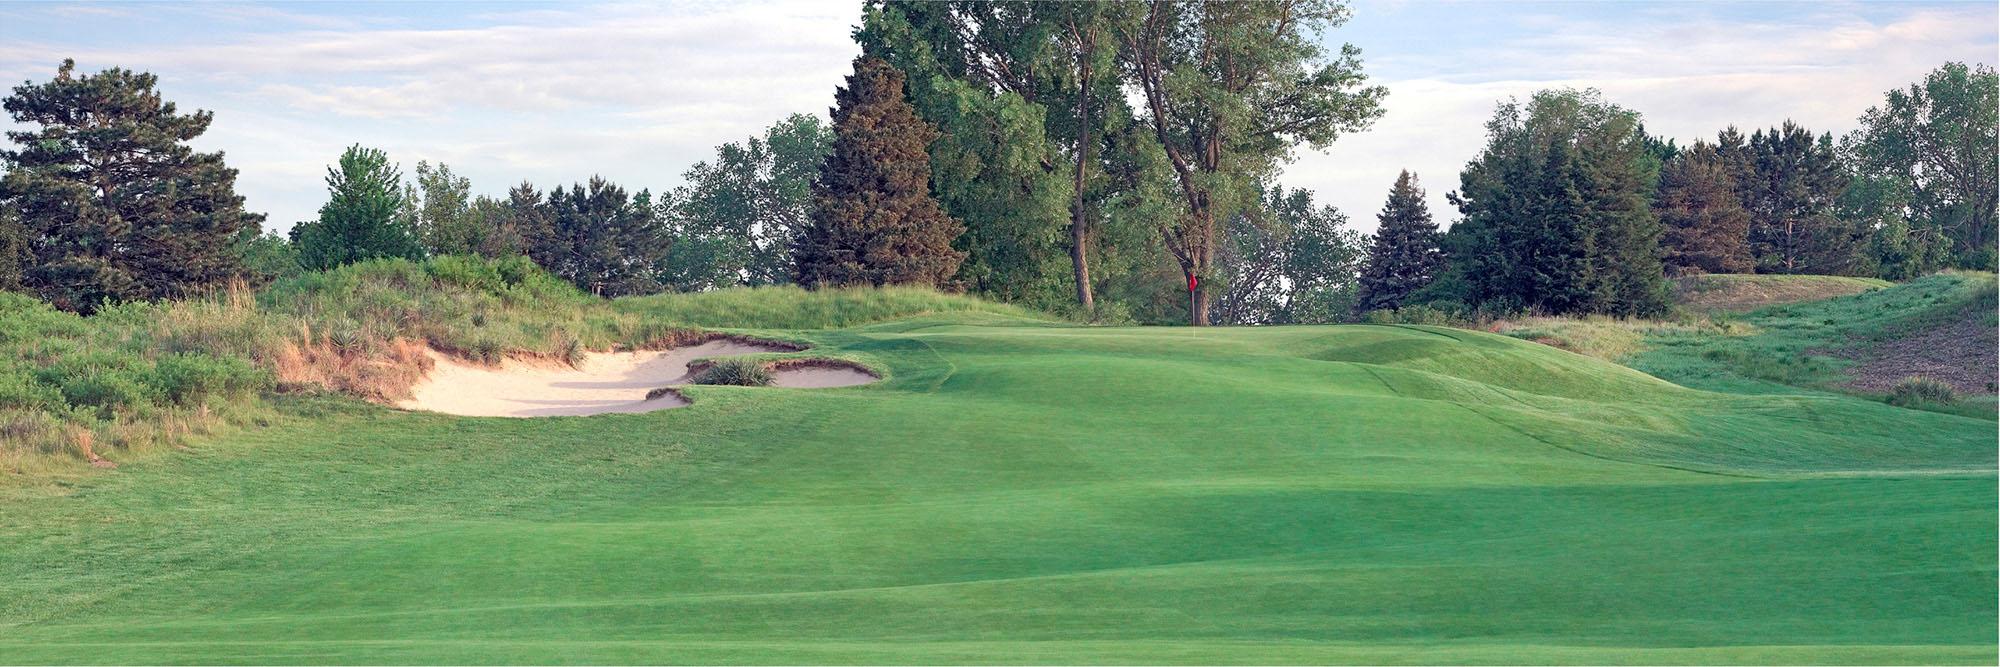 Golf Course Image - Prairie Dunes Country Club No. 17